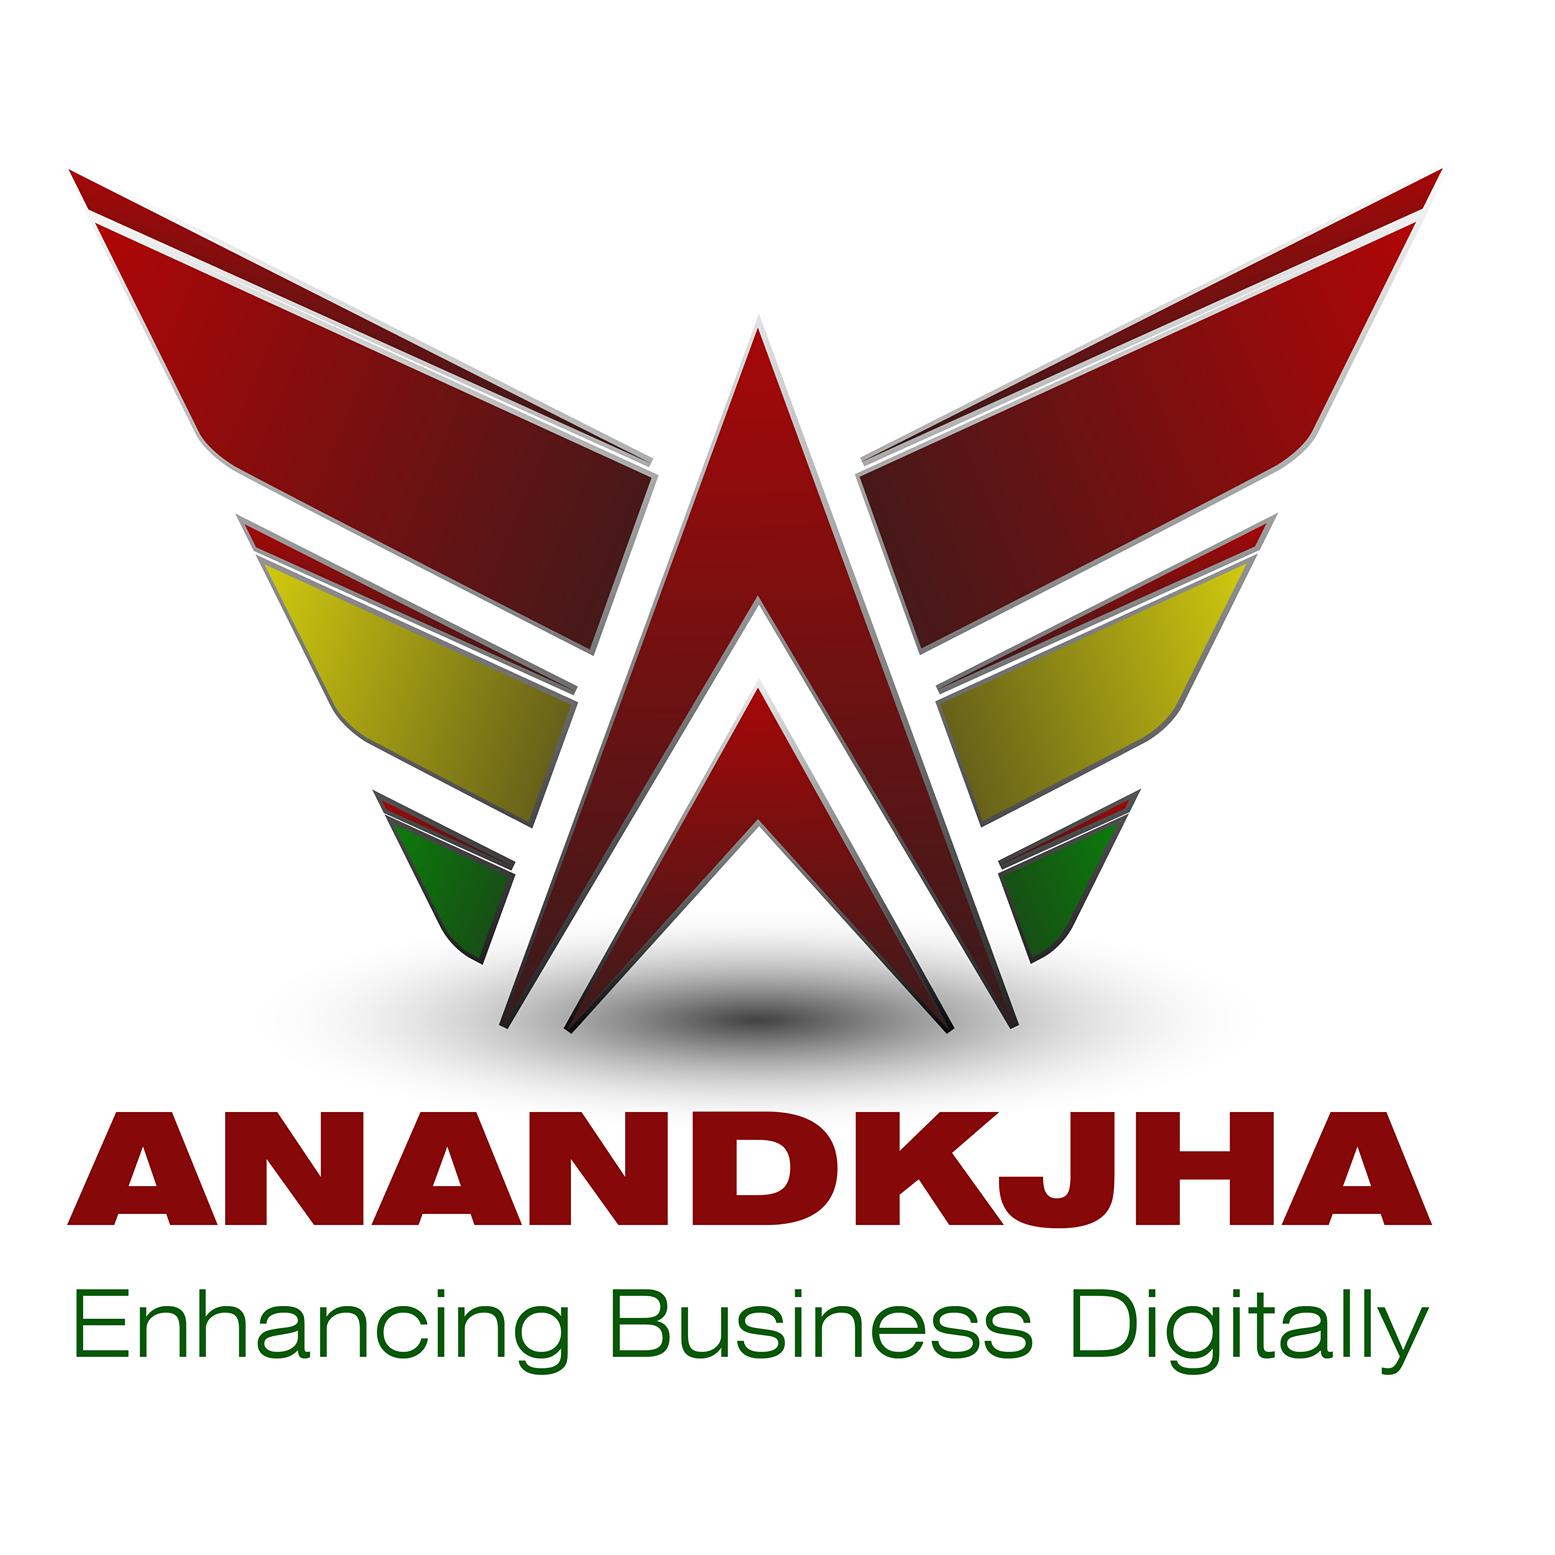 AnandKJha Digital Marketing Services Logo